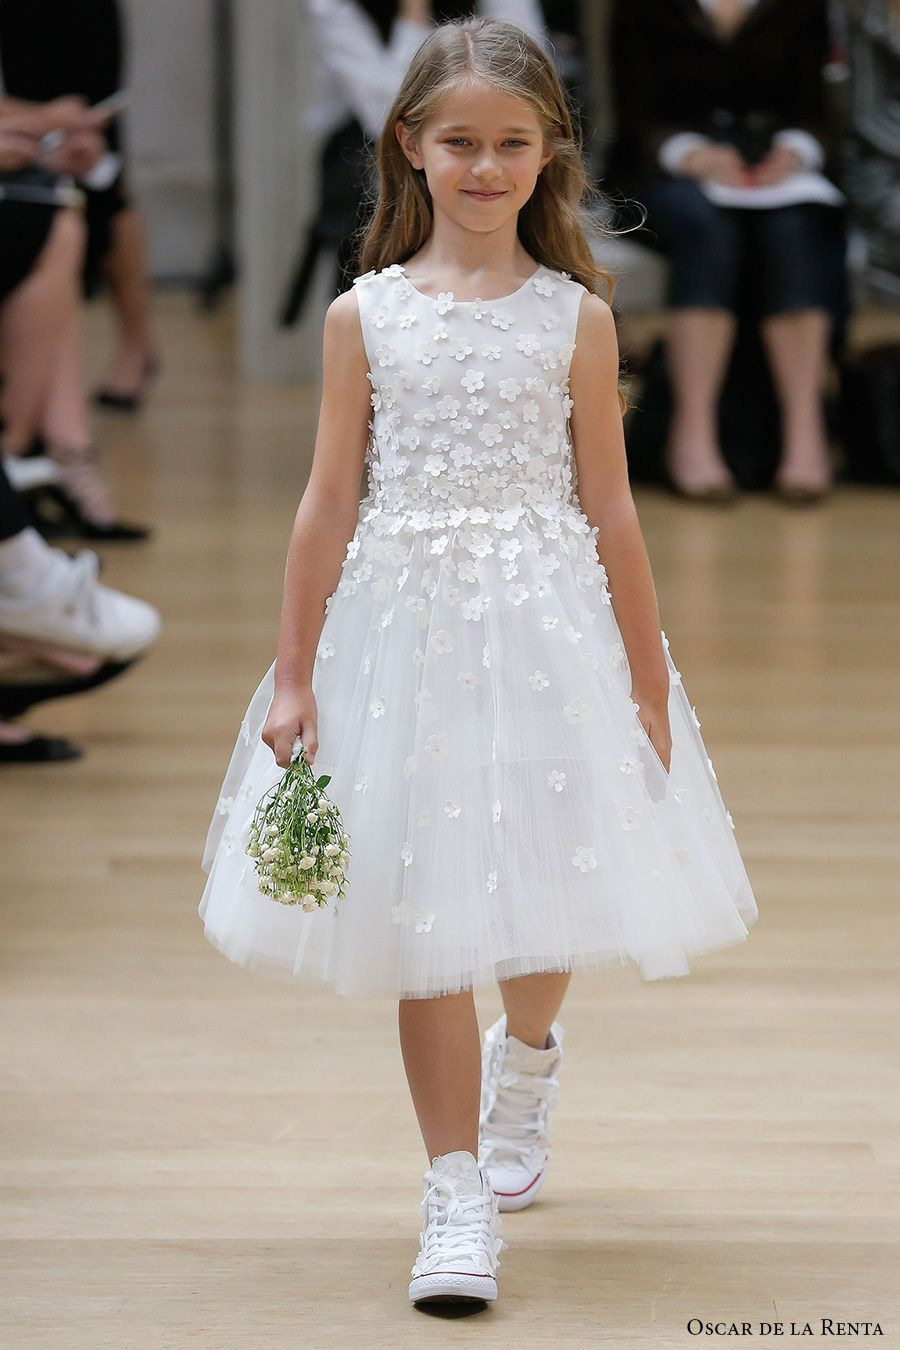 Oscar de la Renta Spring 2018 Wedding Dresses — New York Bridal ...